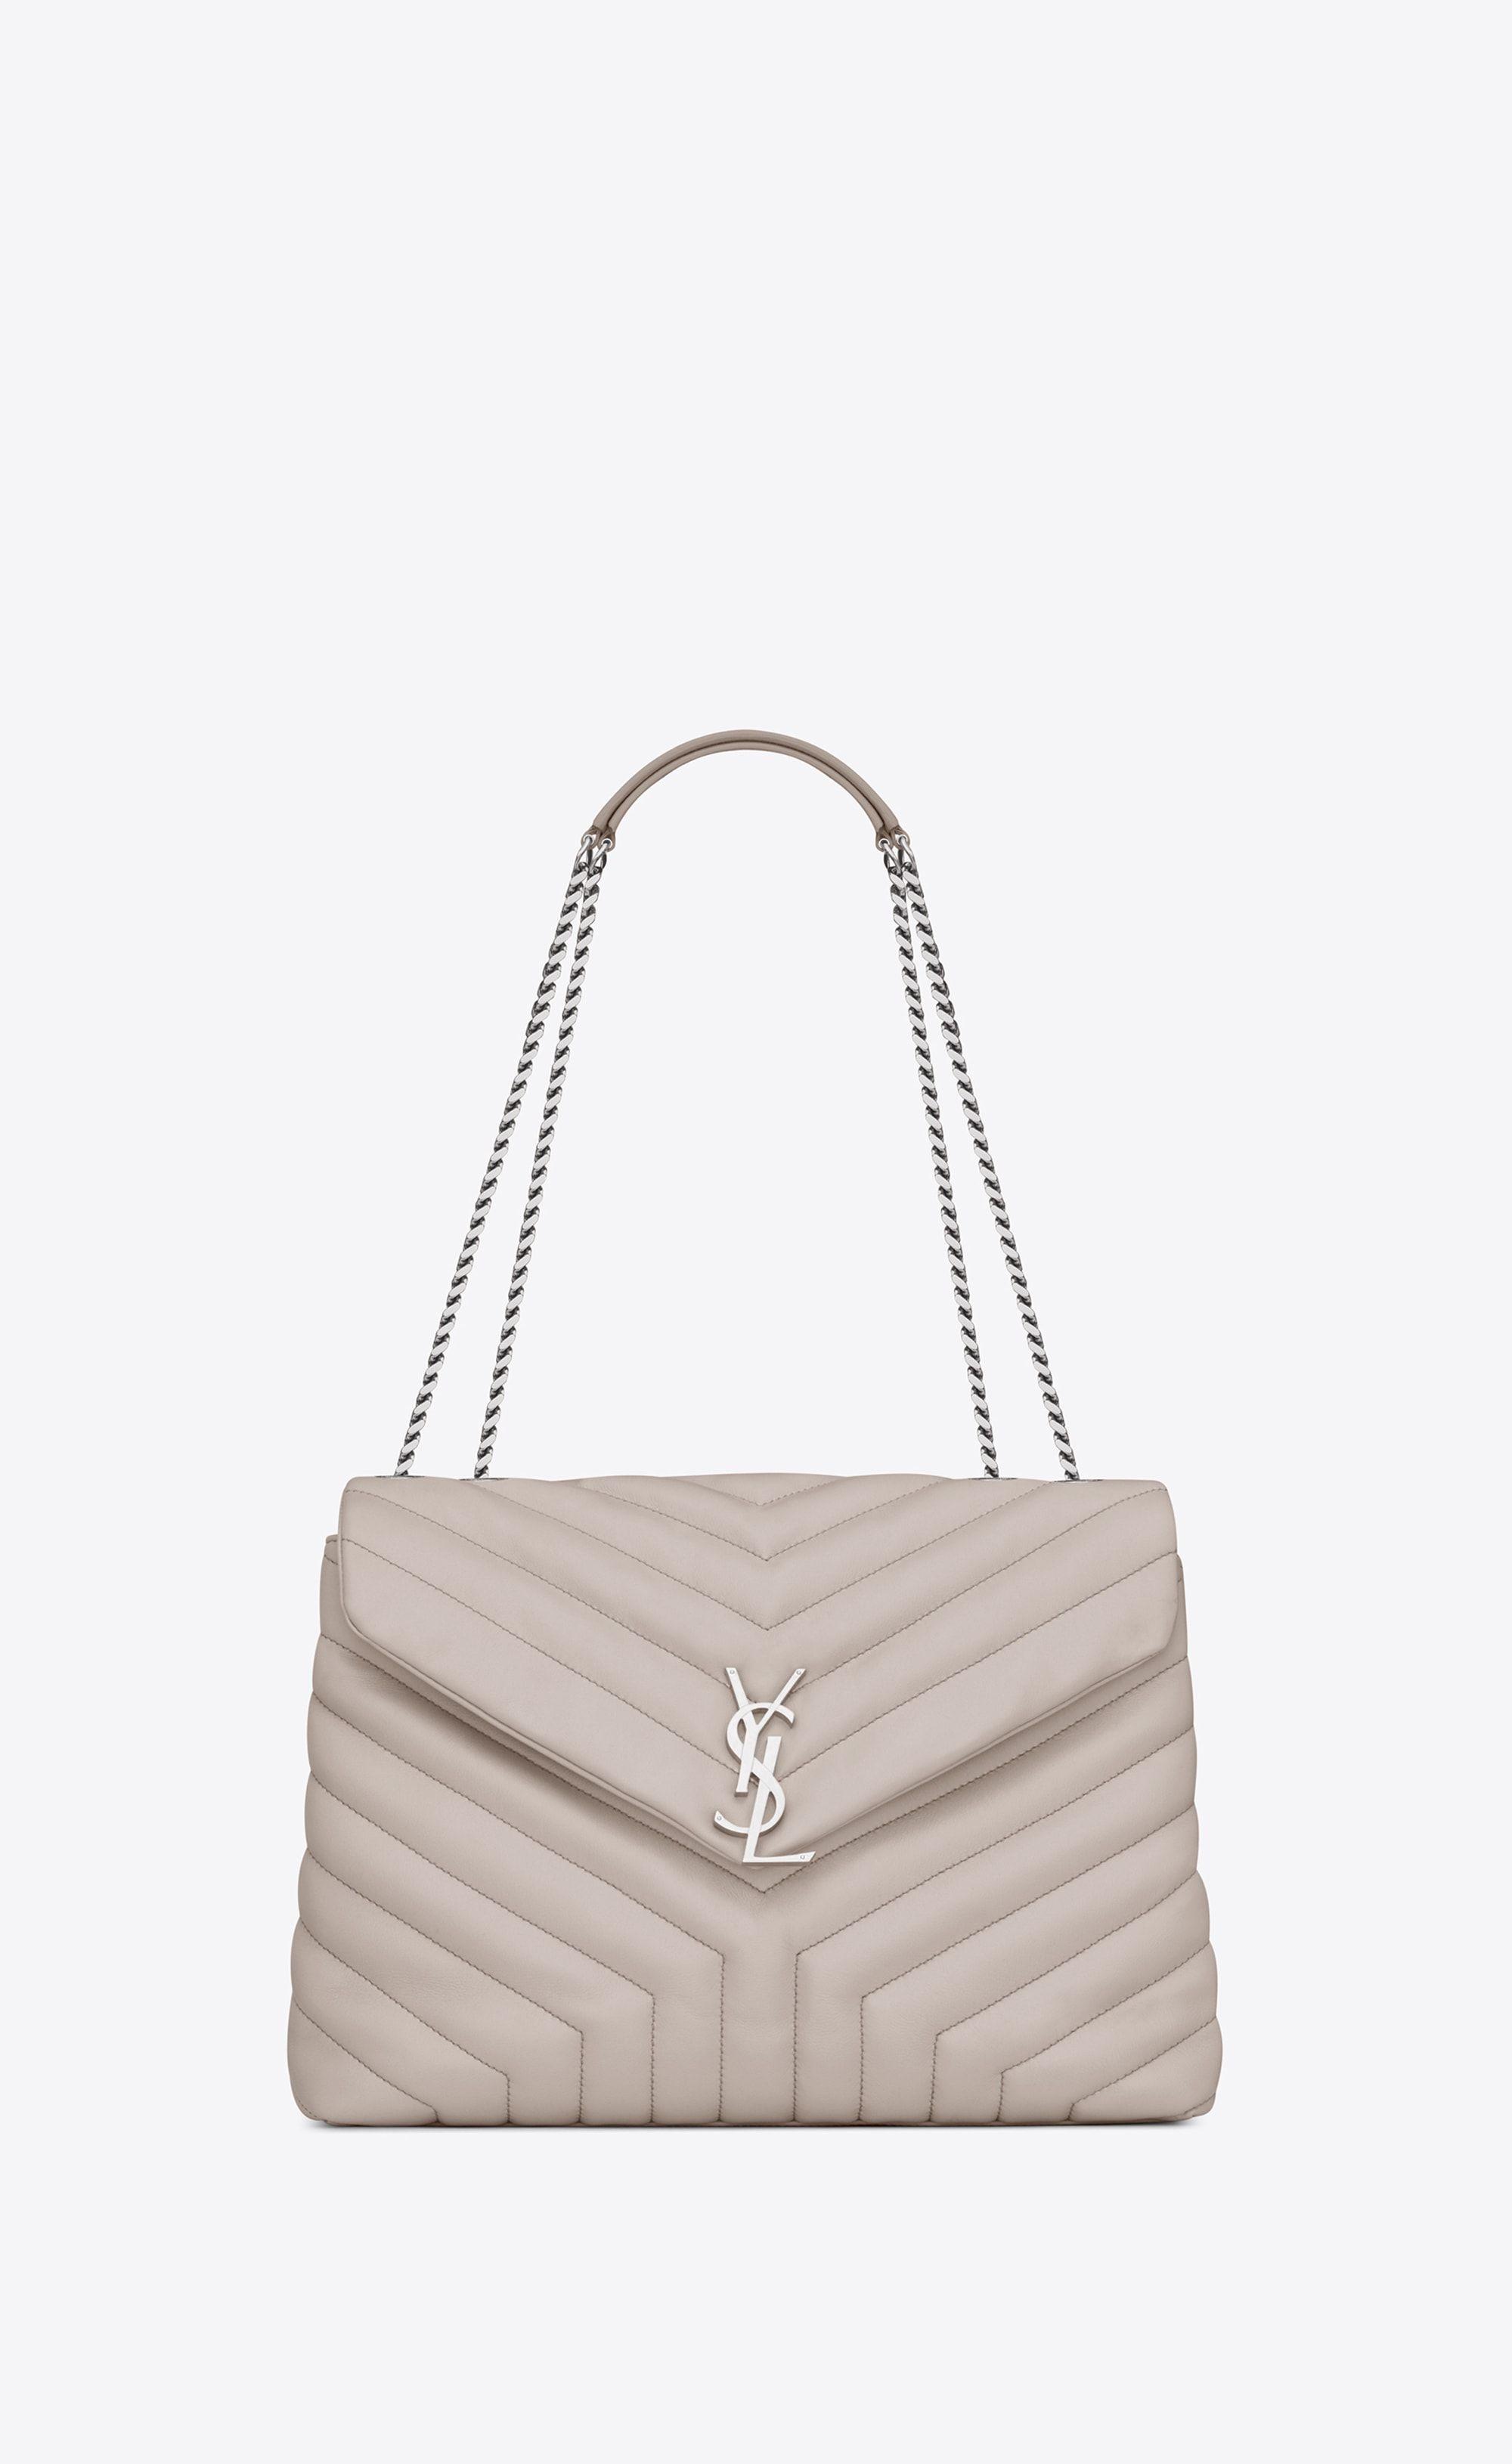 SAINT LAURENT Monogramme Loulou Woman medium loulou chain bag in black  tulip